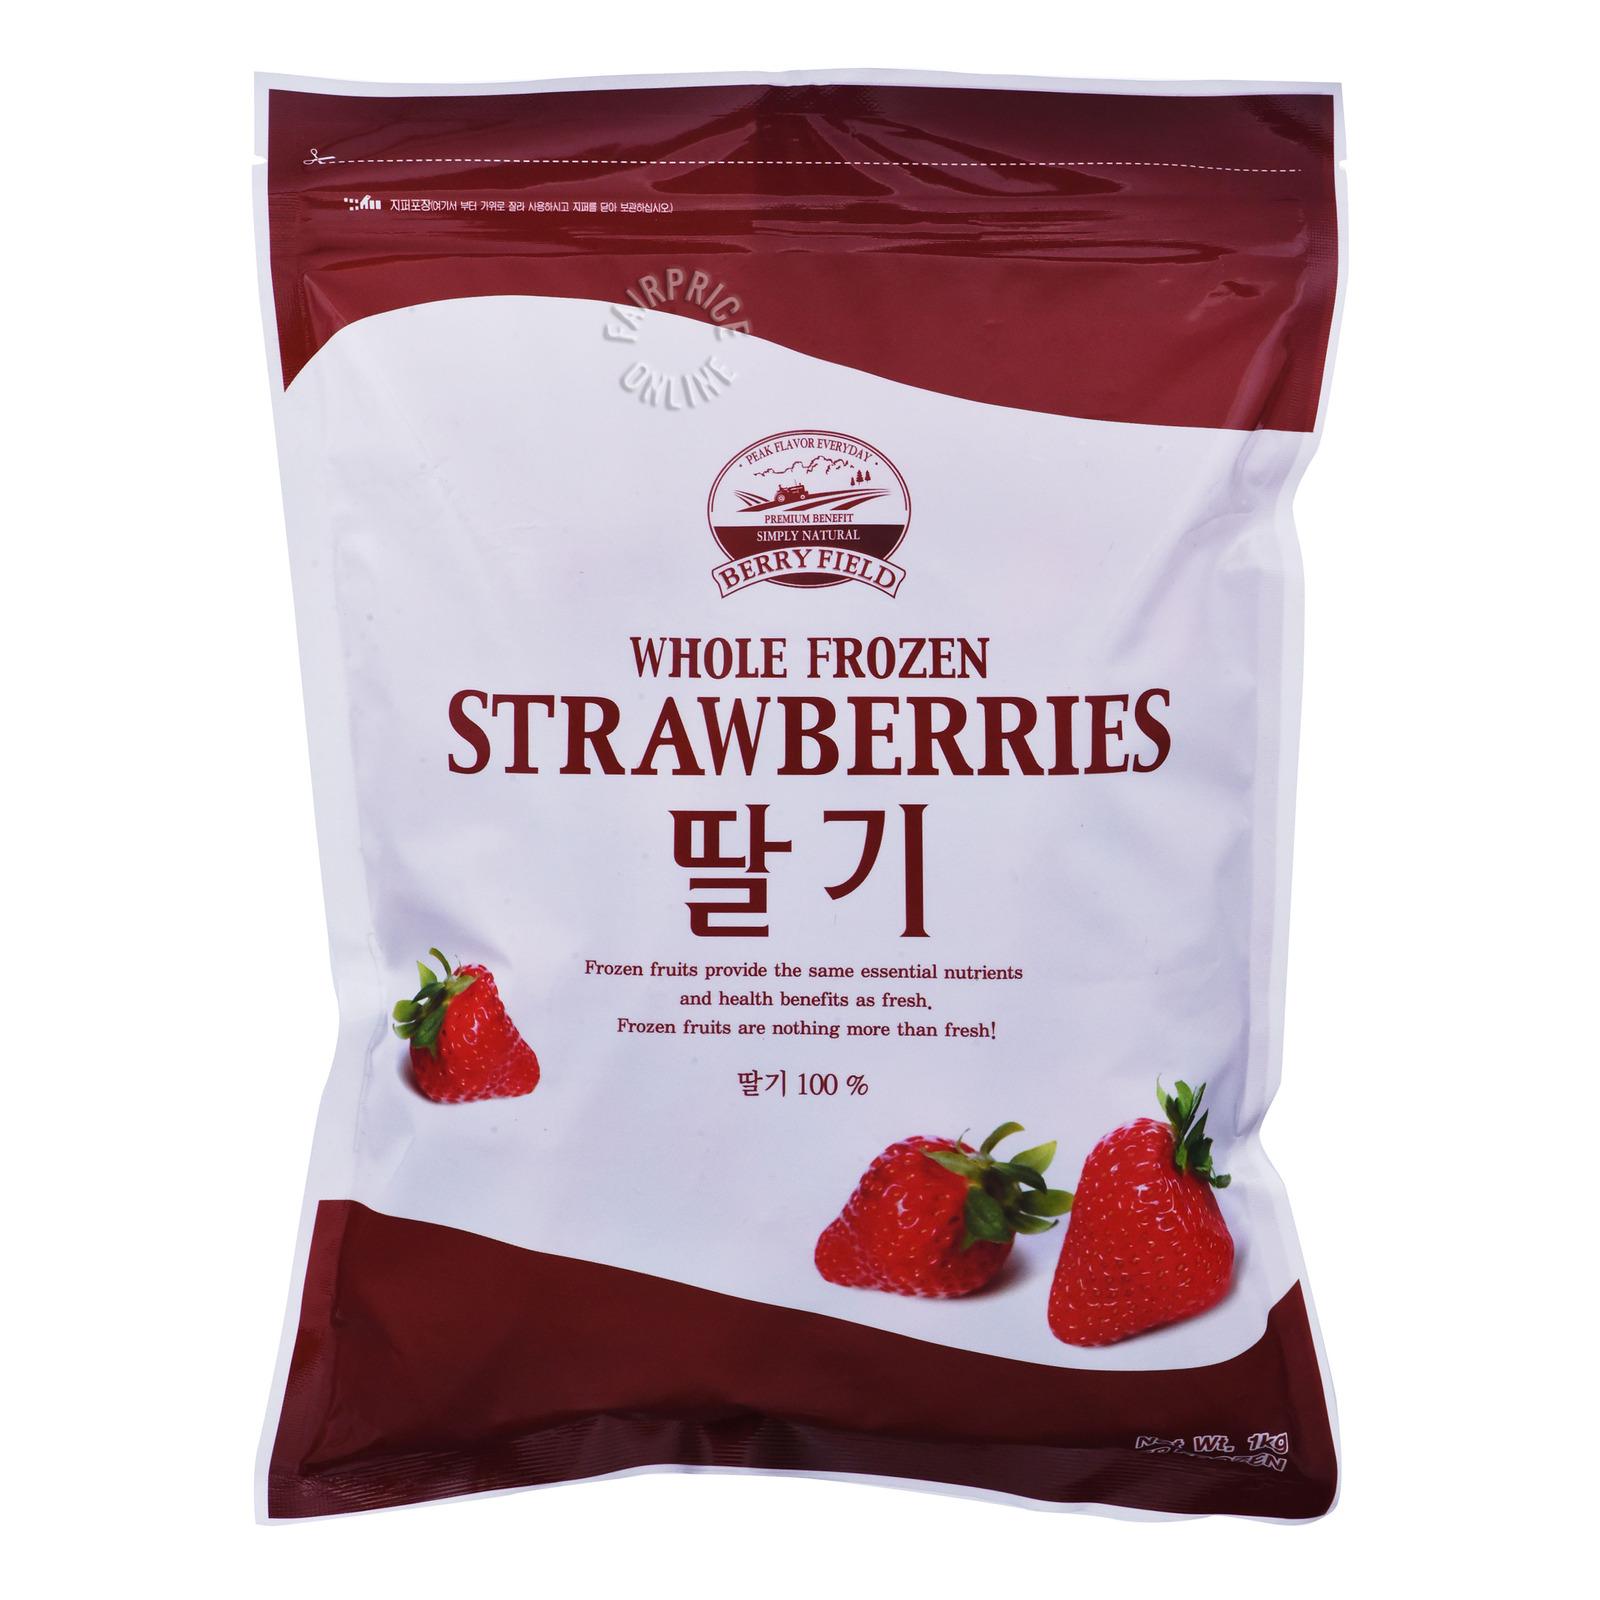 Berryfield Whole Frozen Strawberries